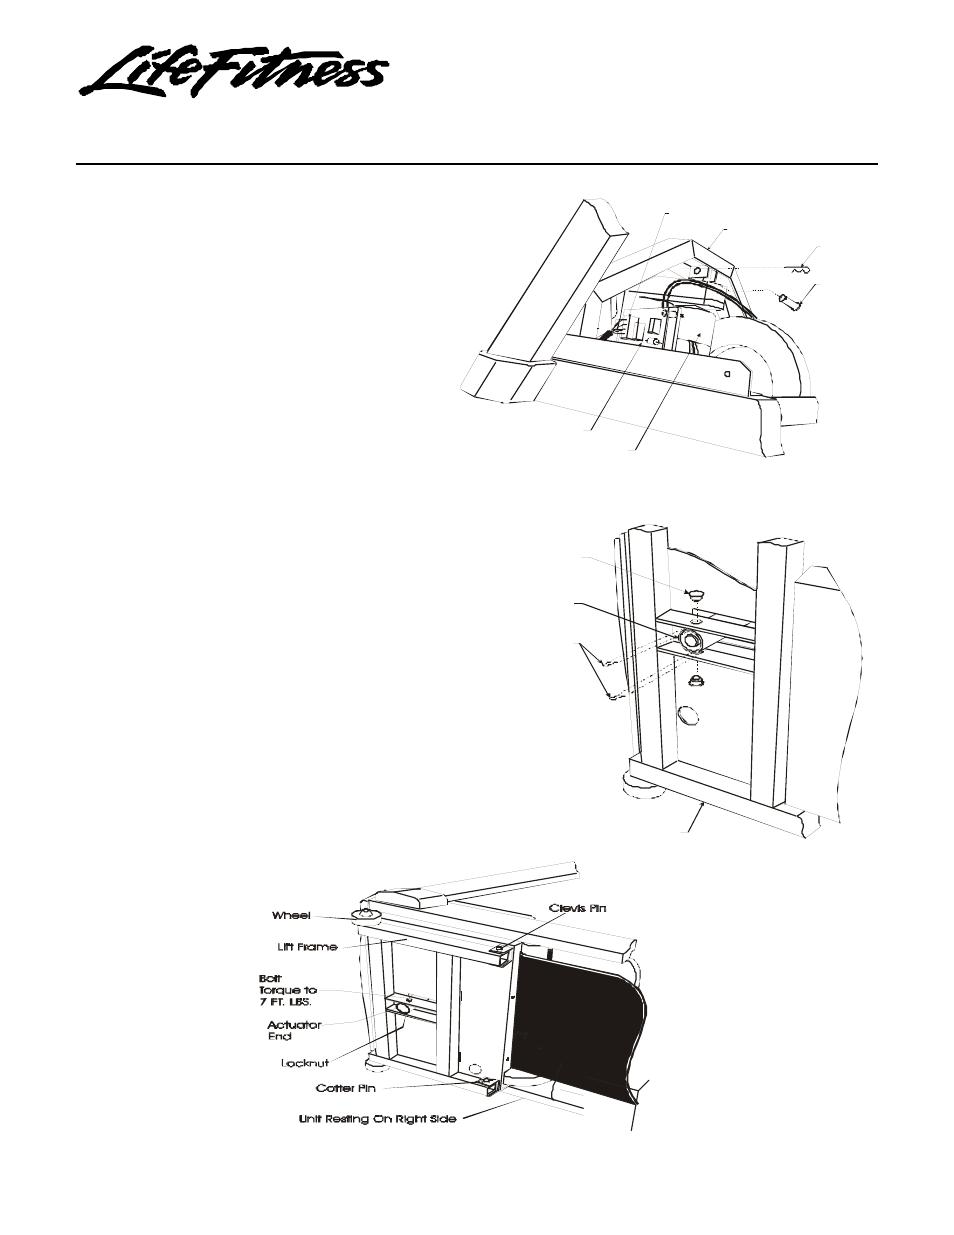 life fitness 5500hr treadmill manual